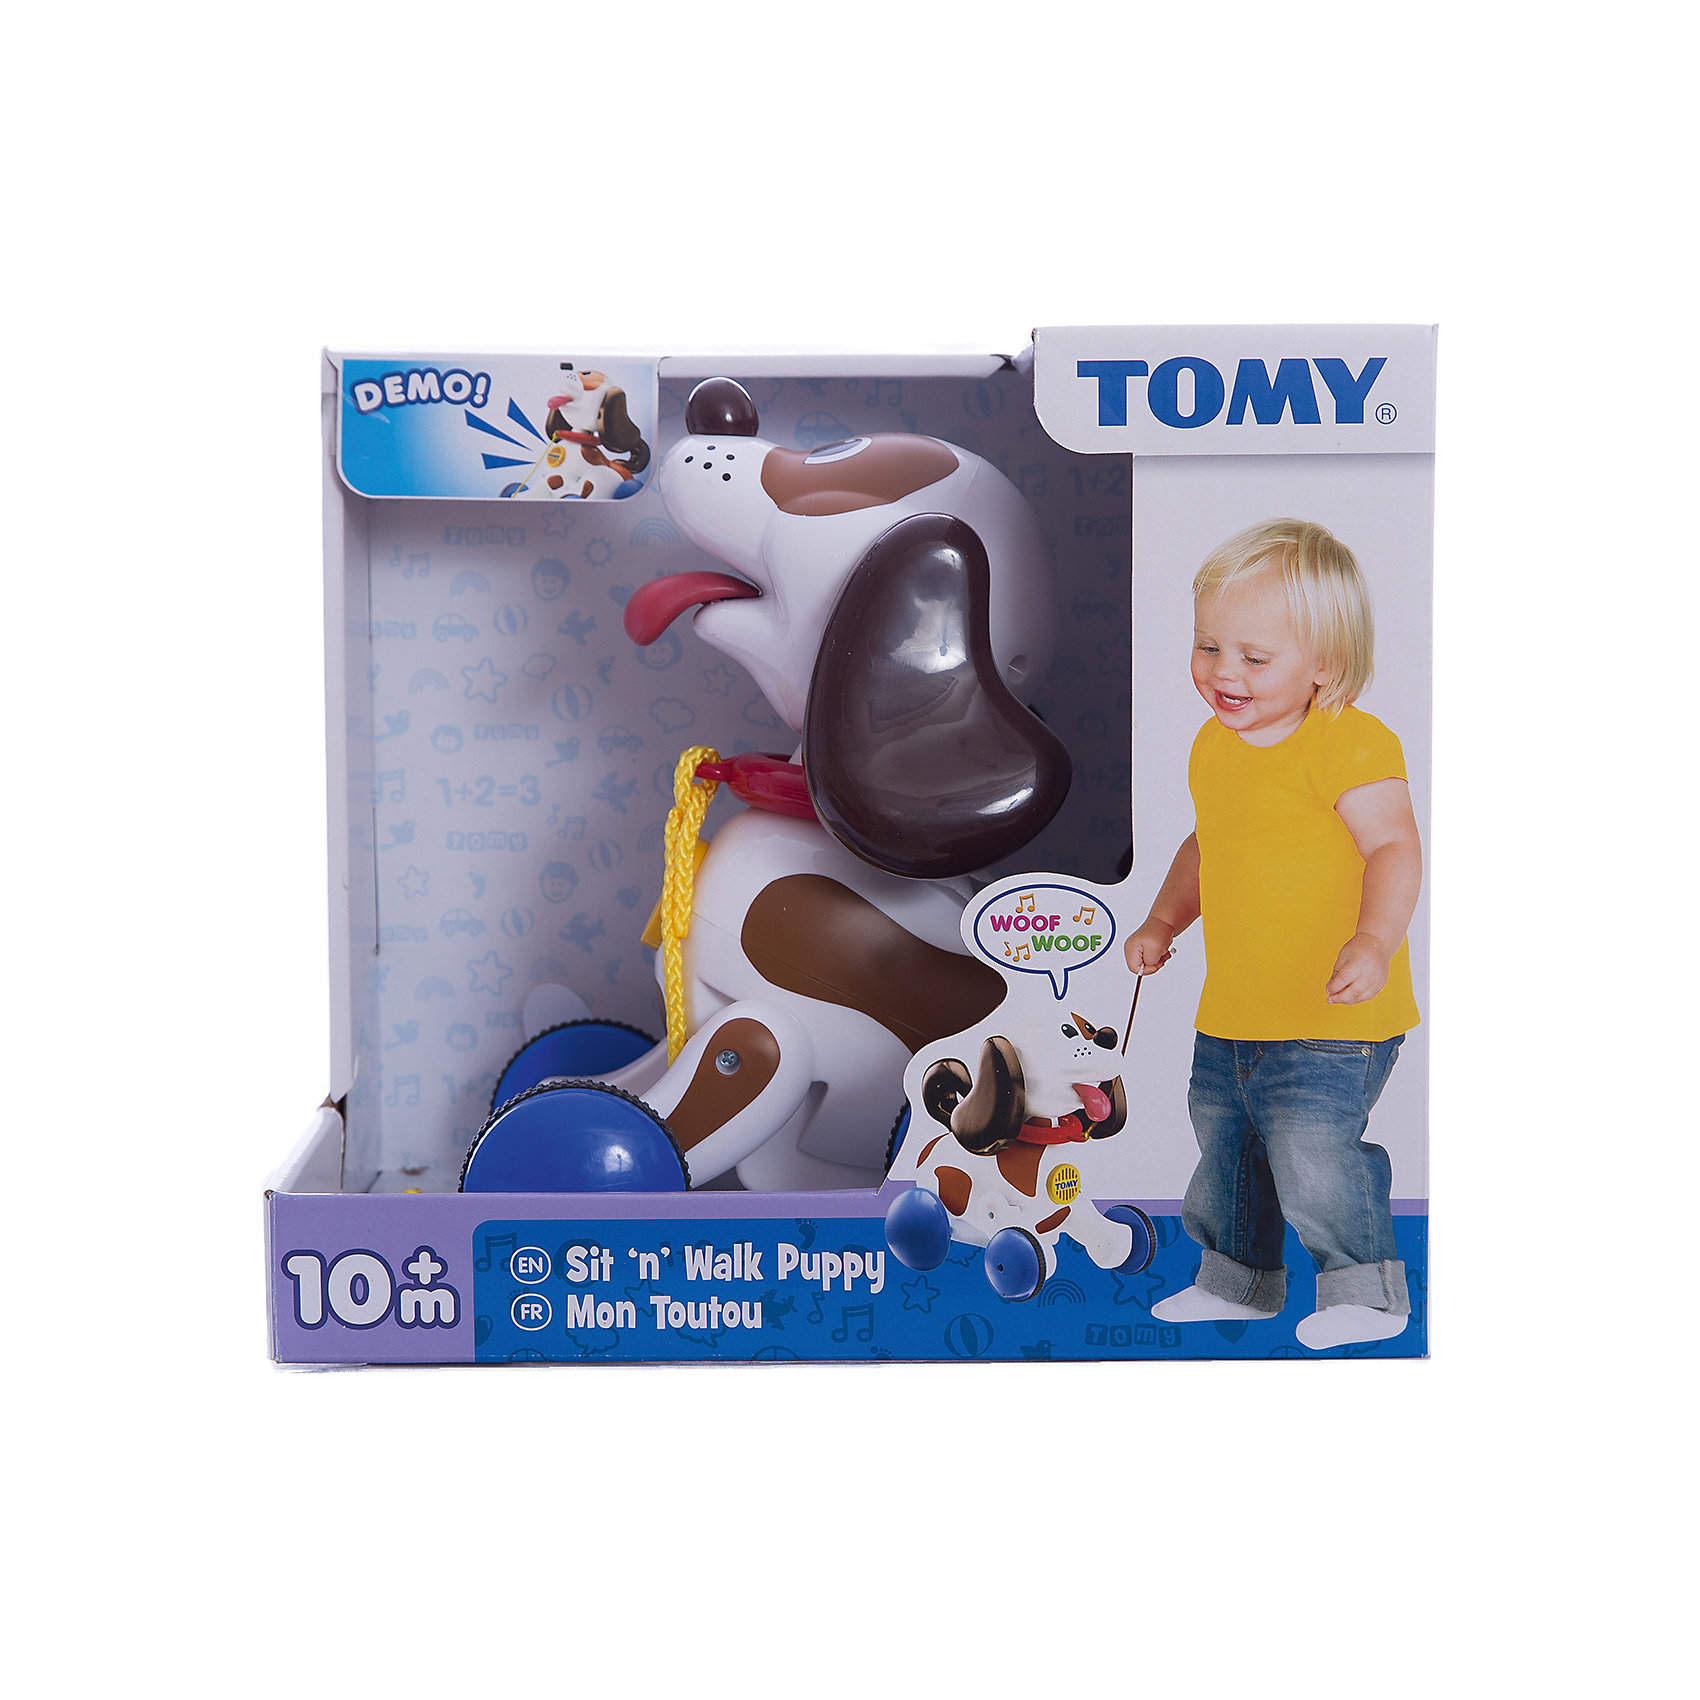 TOMY Развивающая игрушка-каталка Щенок, TOMY